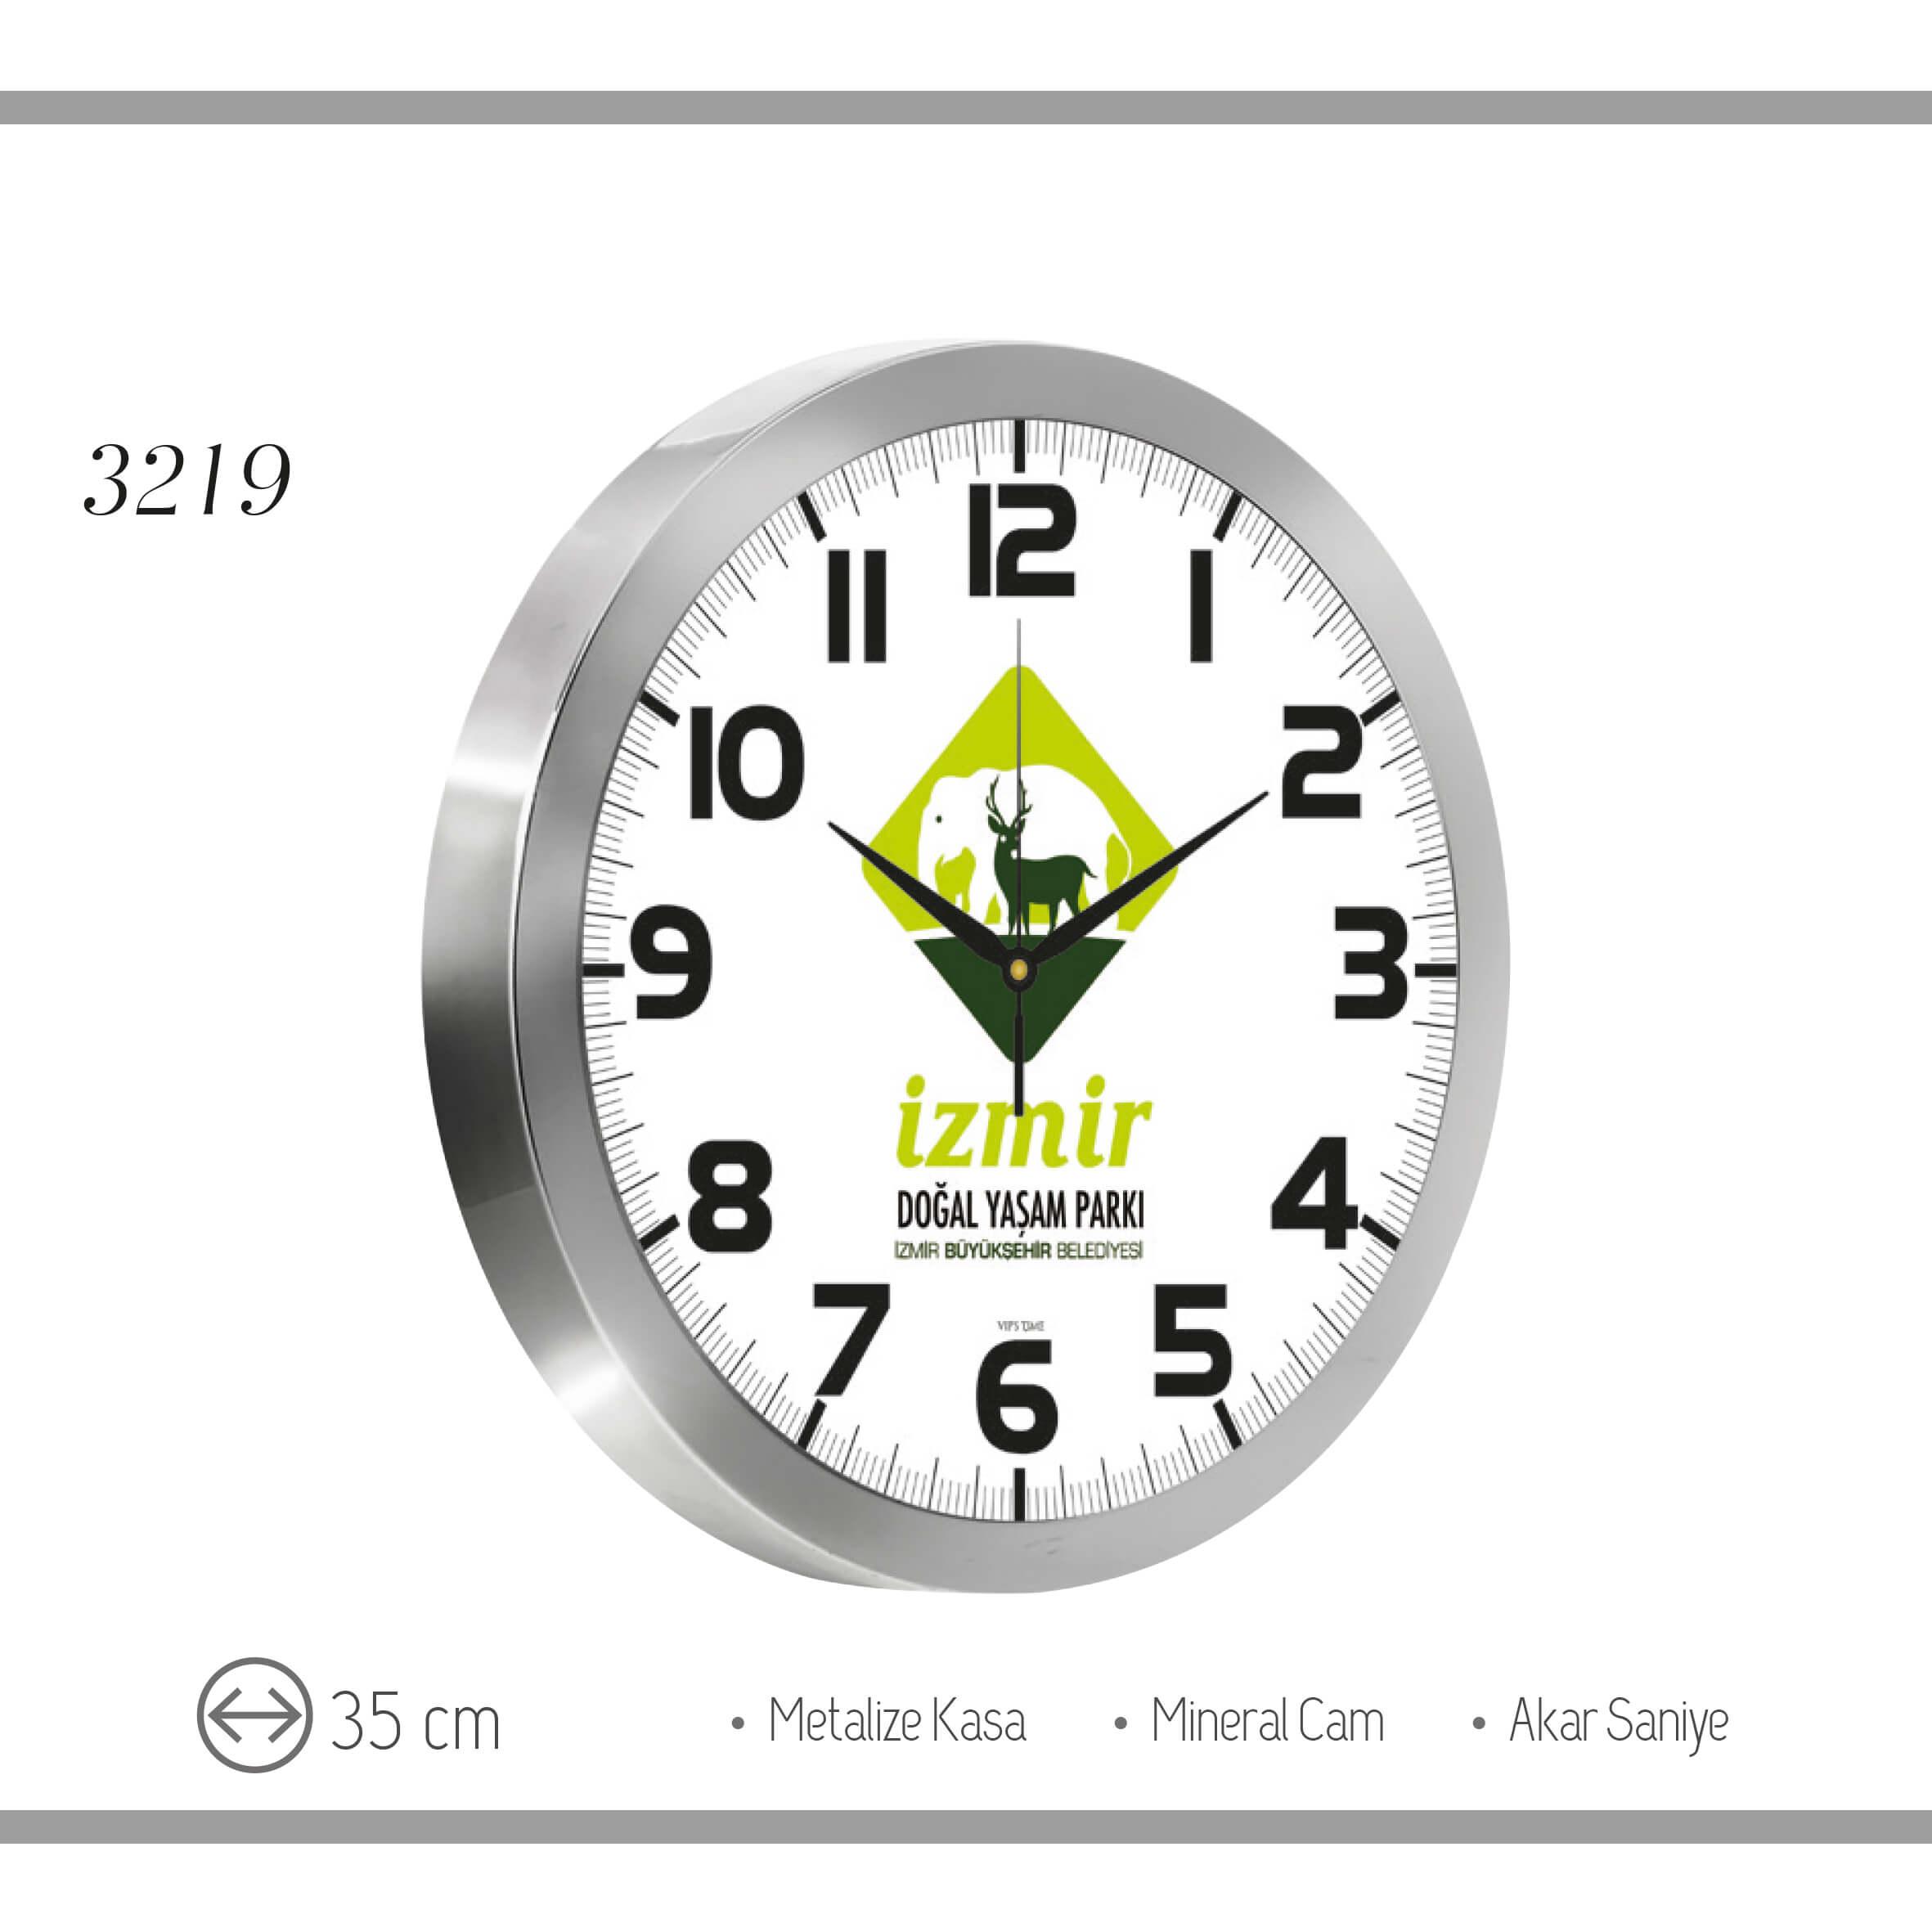 promosyon-promosyon ürünleri-promosyon saatler-duvar saatleri-promosyon duvar saati 3219